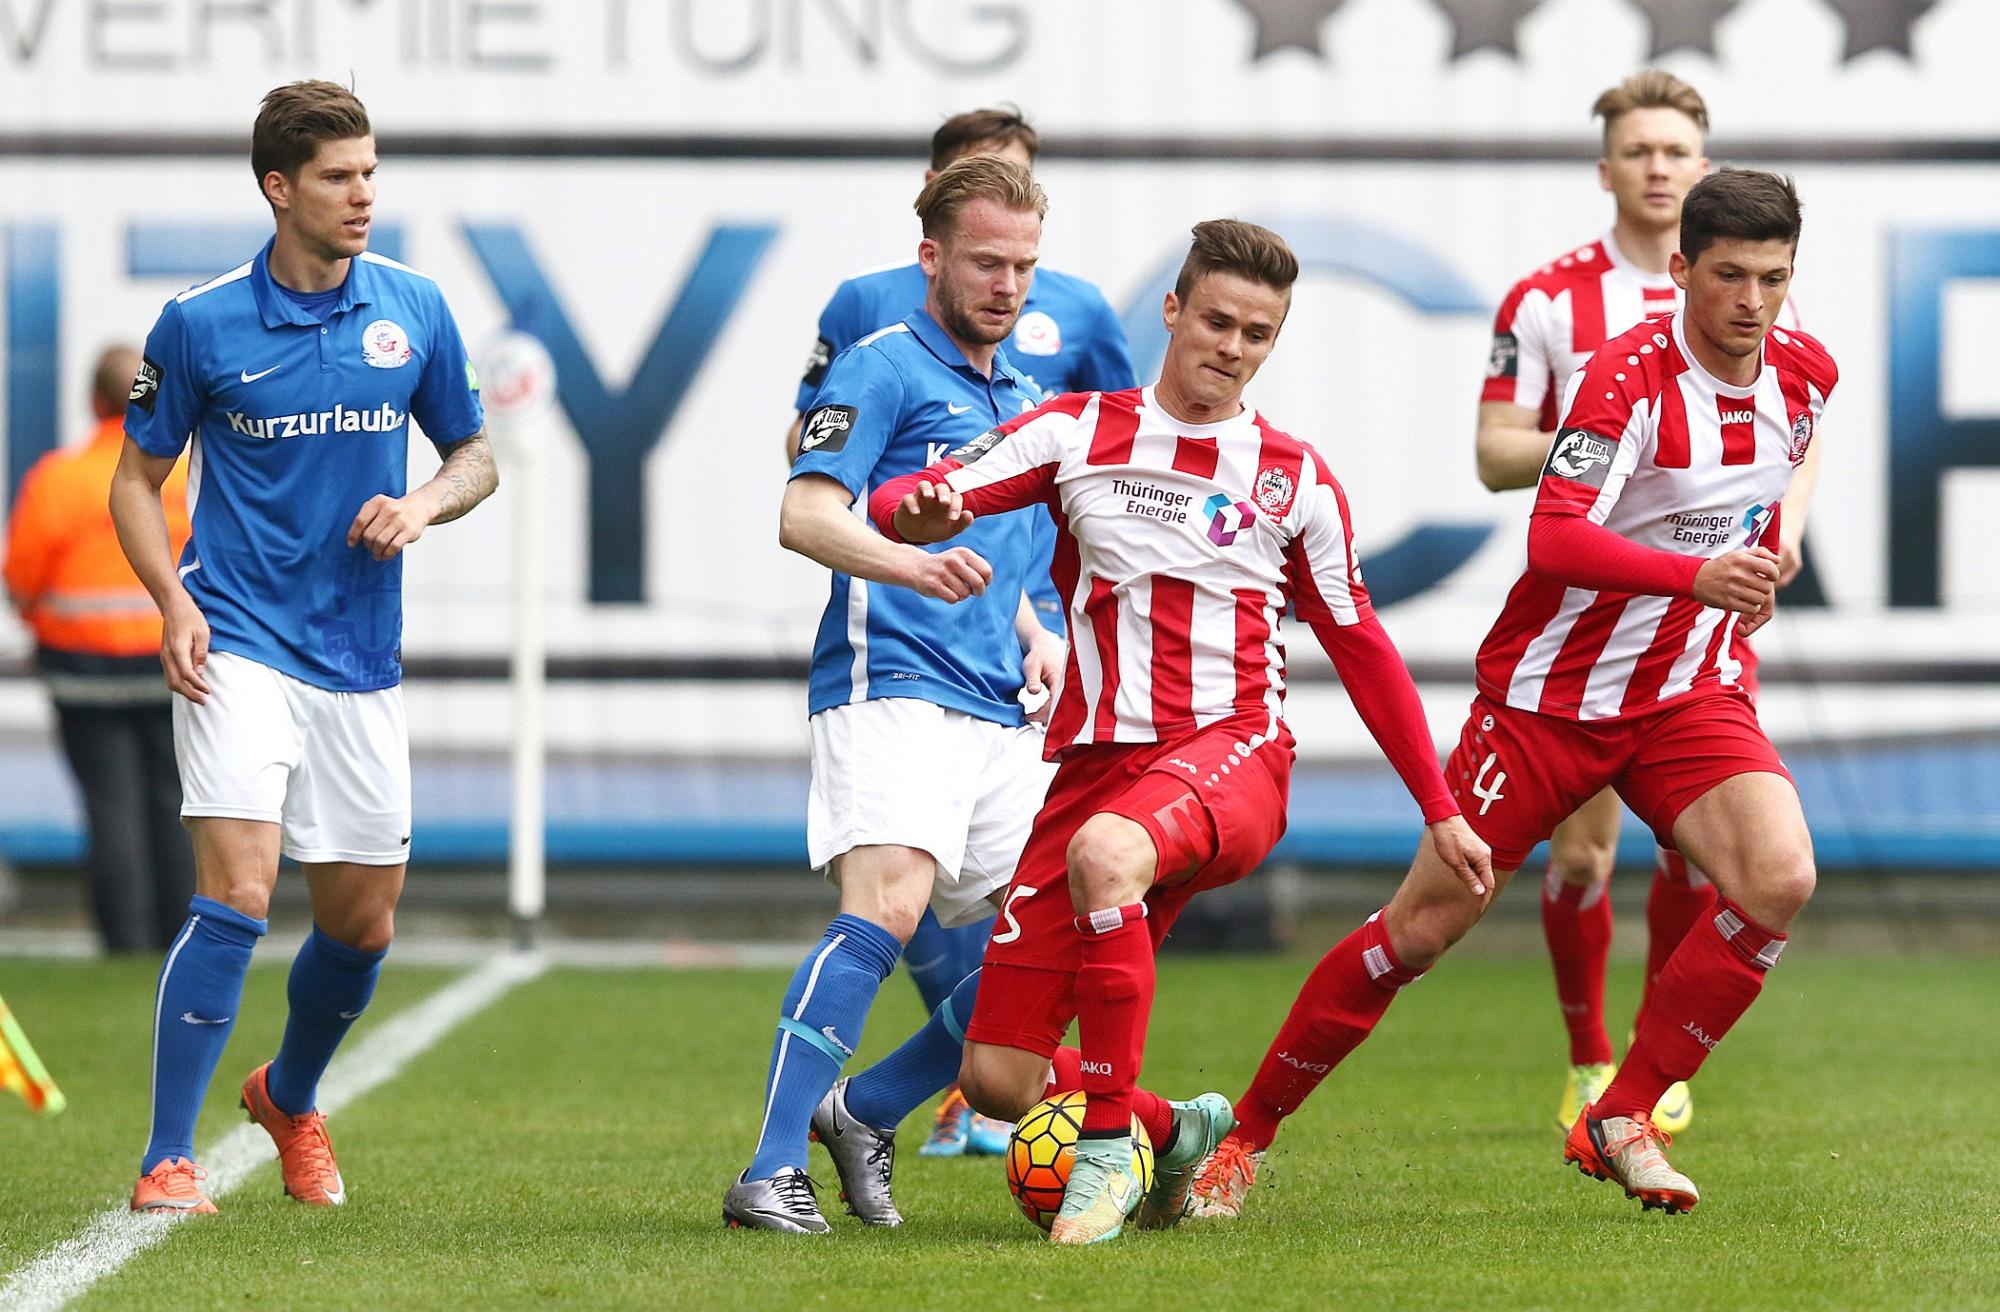 Spielbericht Rostock 01